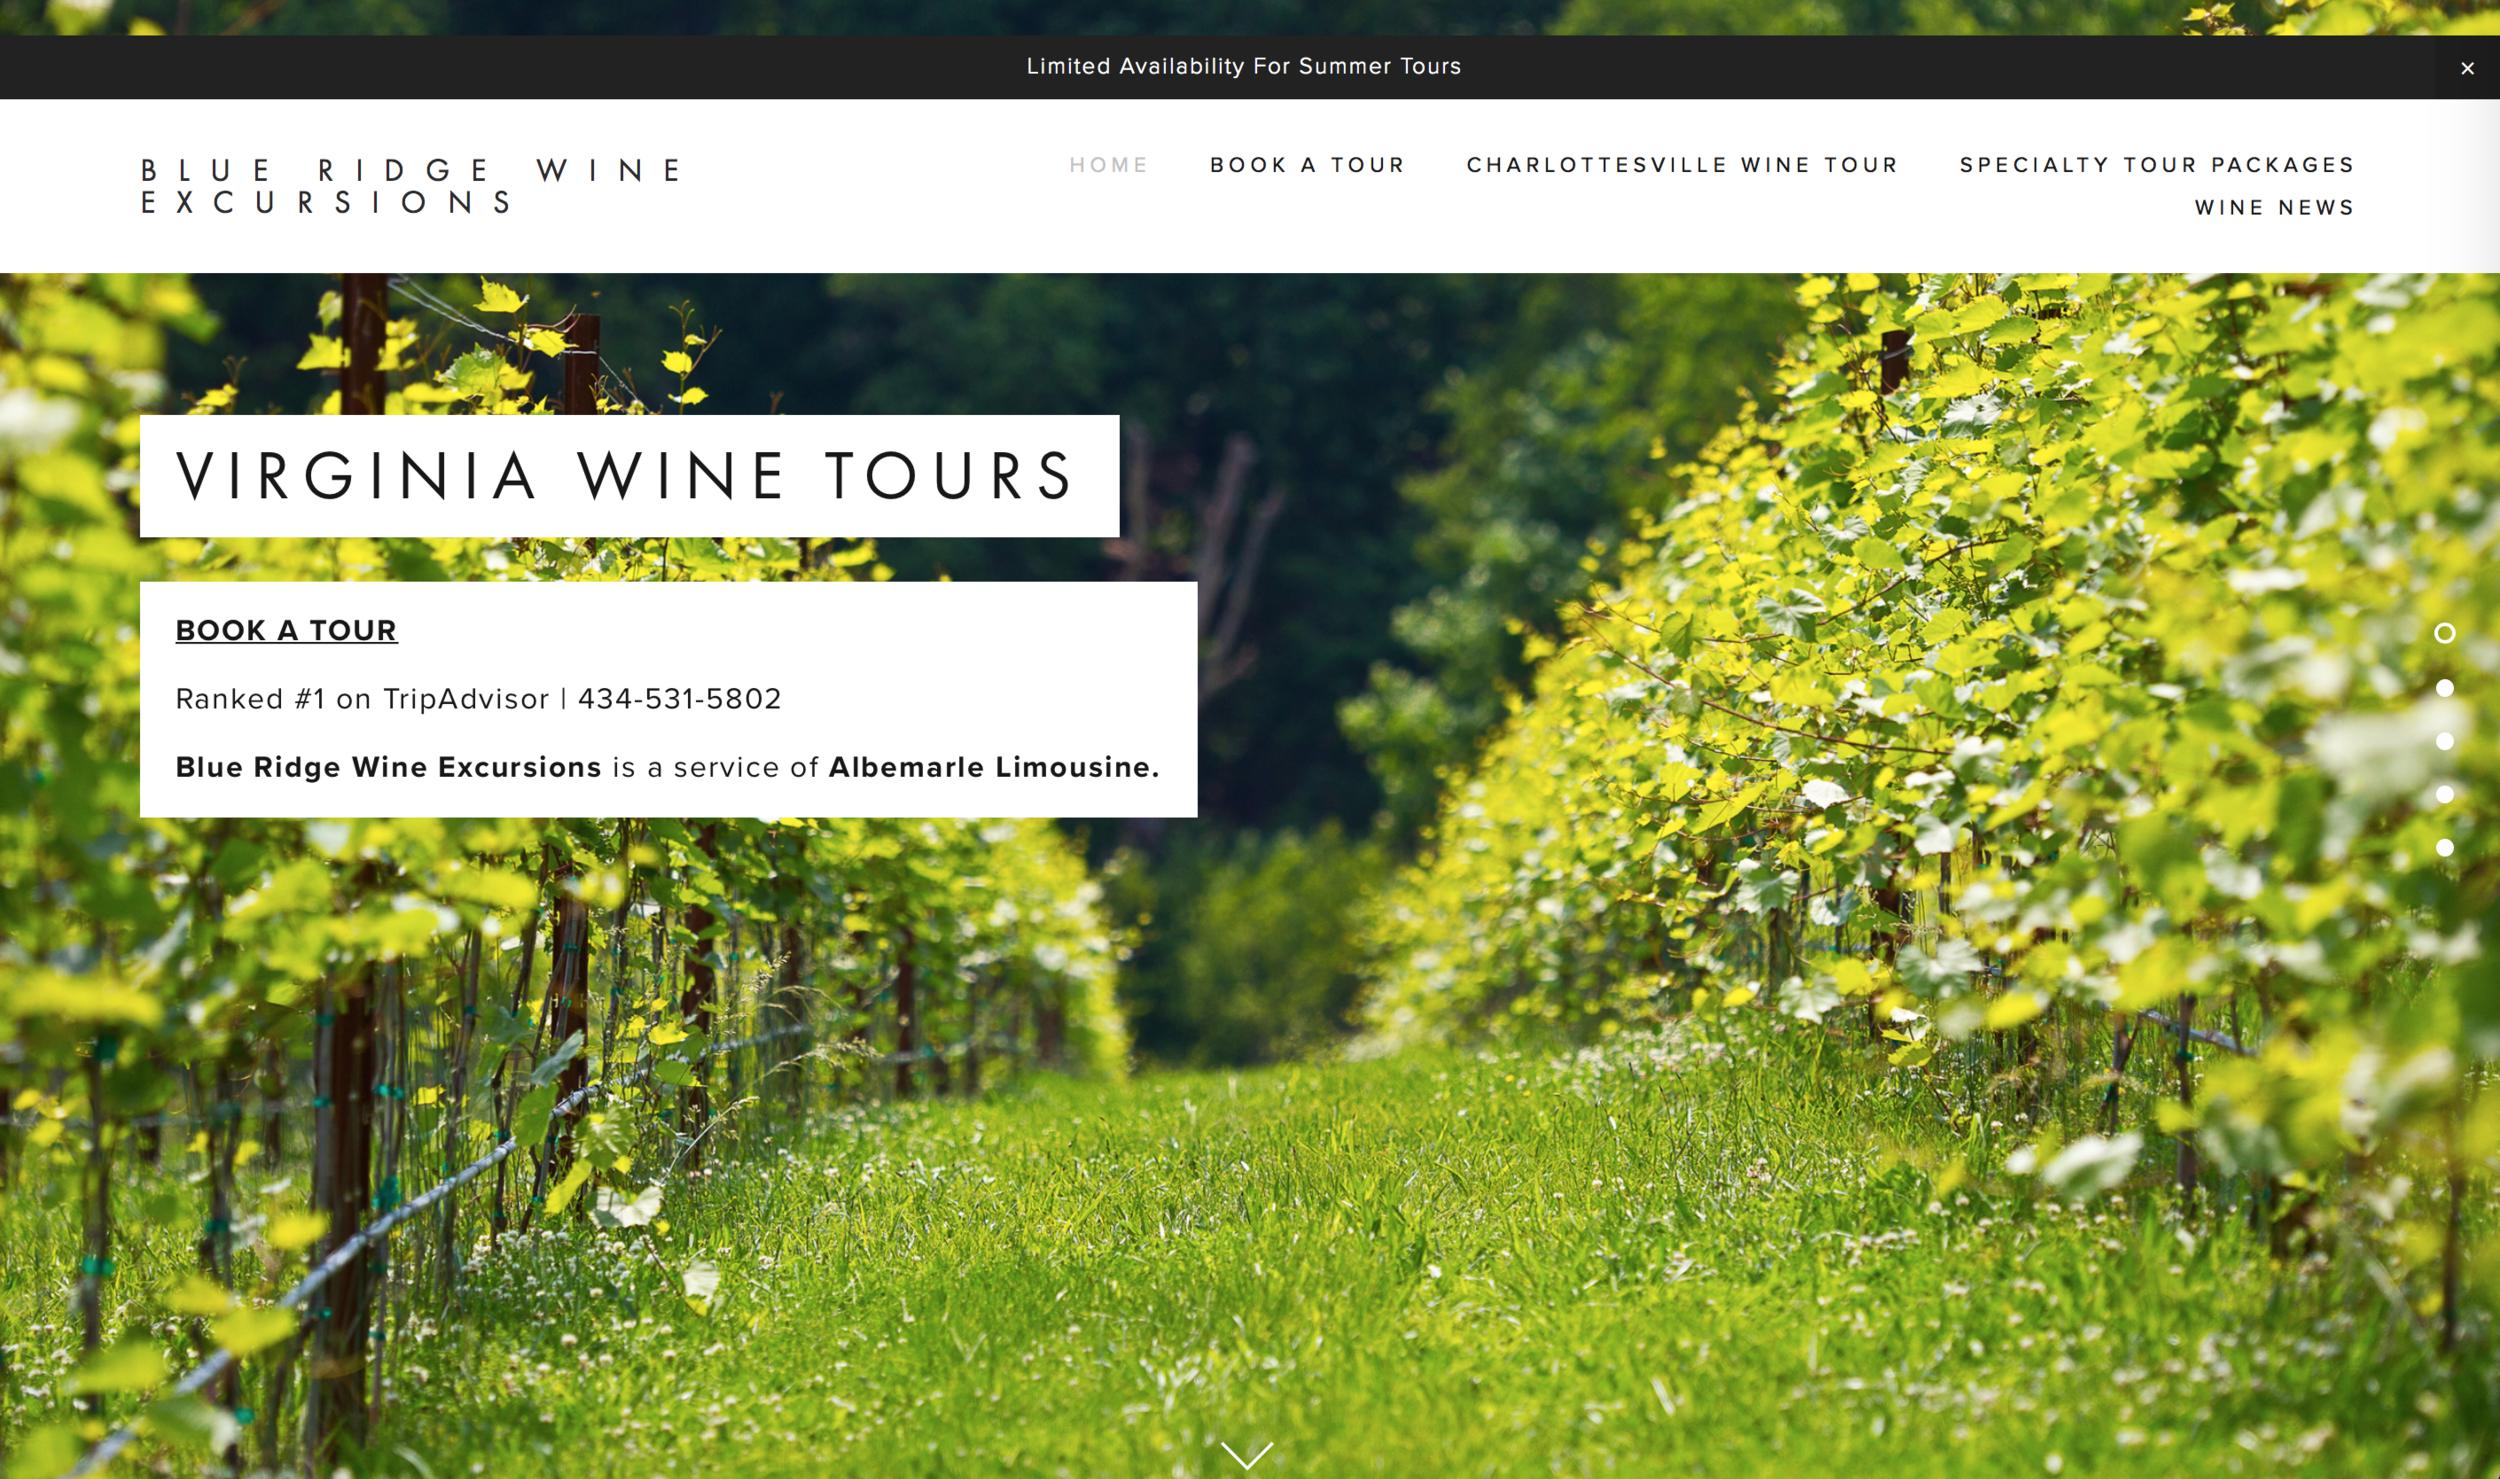 Website Design - Blue Ridge Wine Excursions